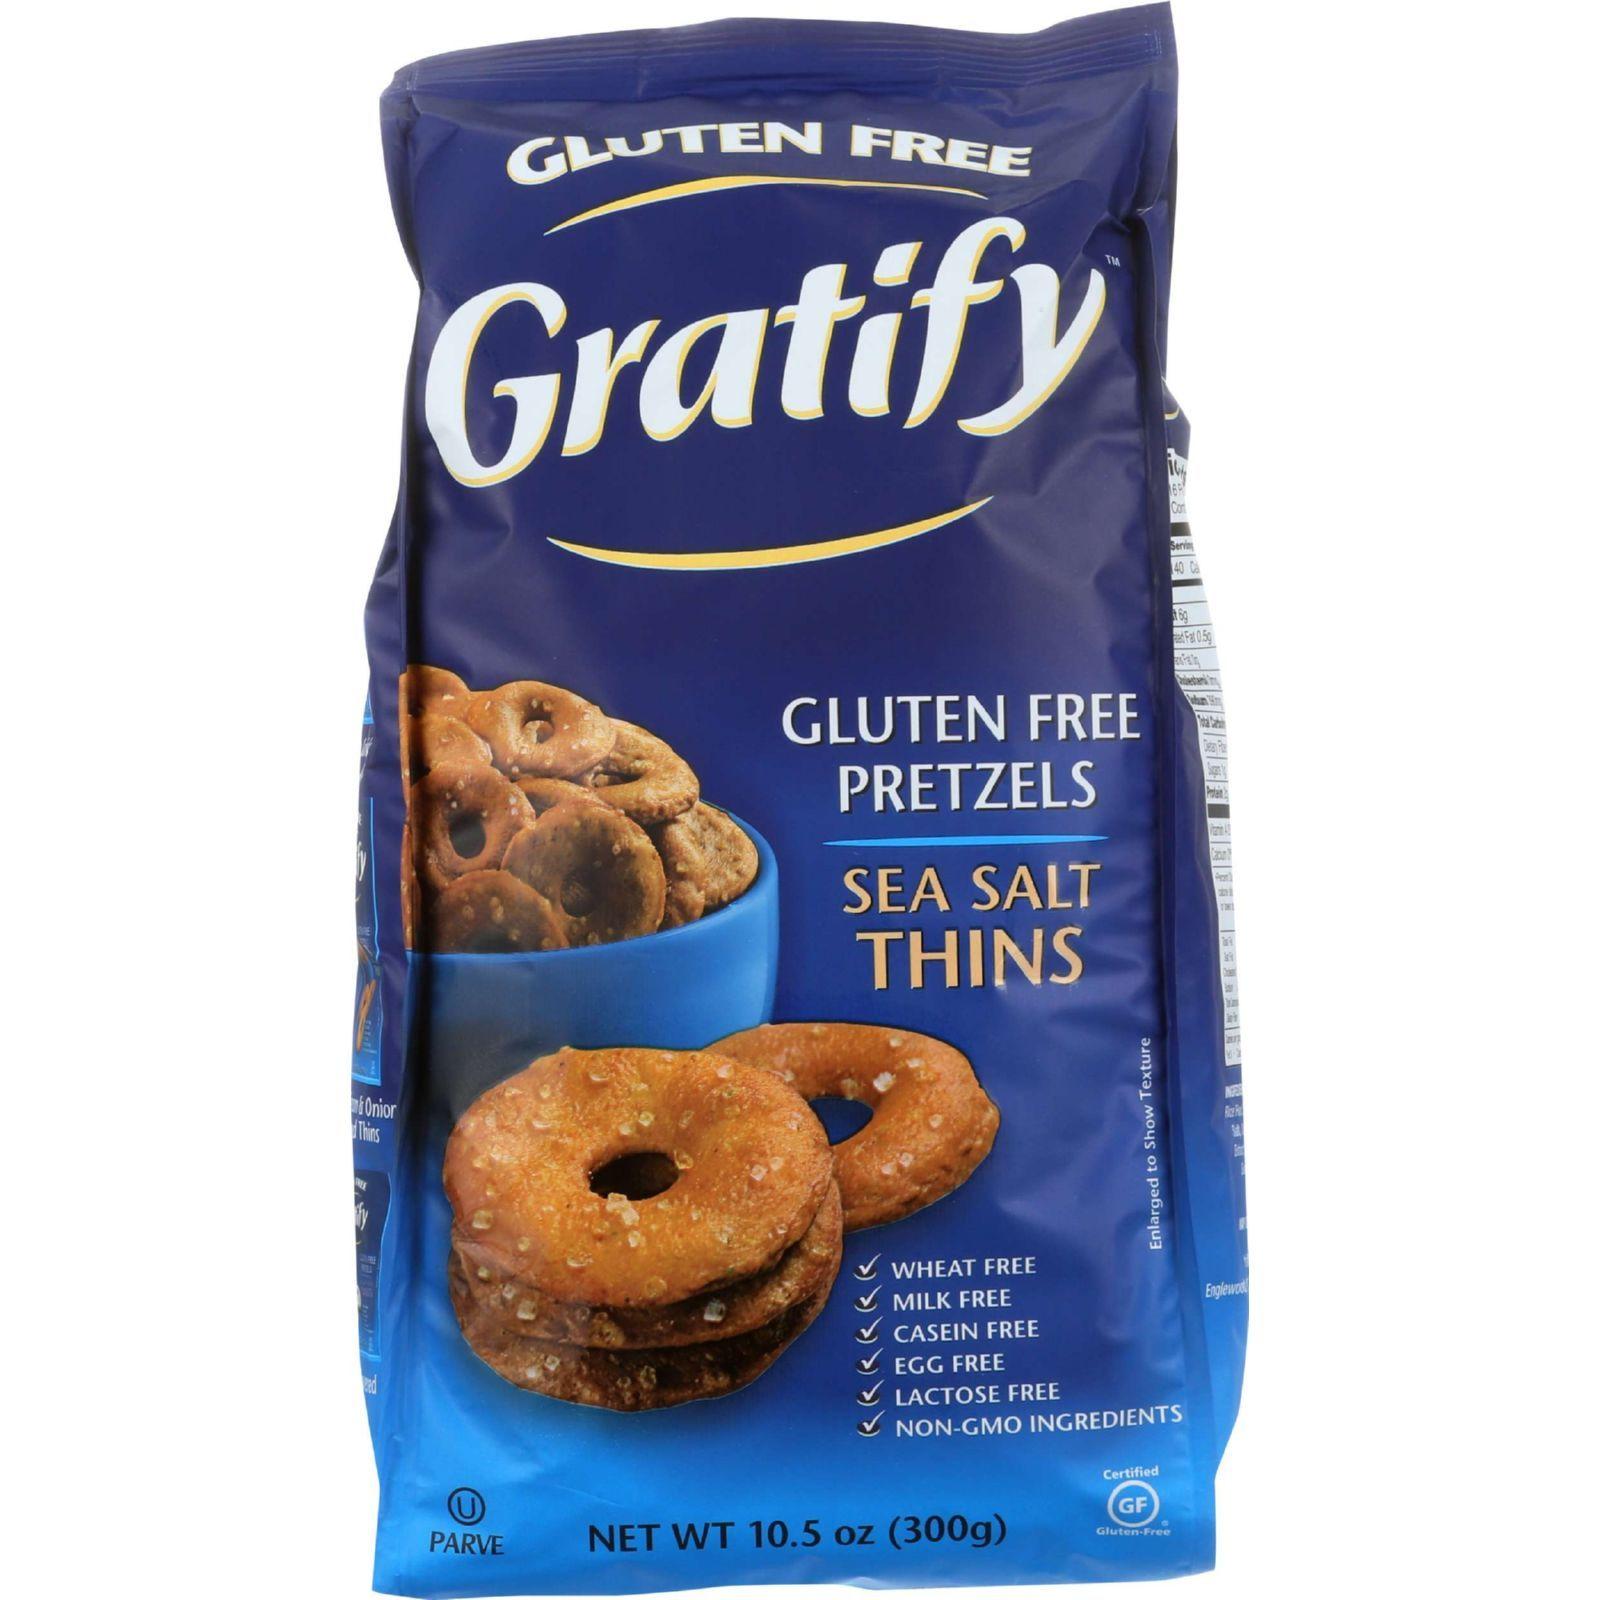 Gratify Pretzels - Thins - Sea Salt - Gluten Free - 10.5 oz - case of 6